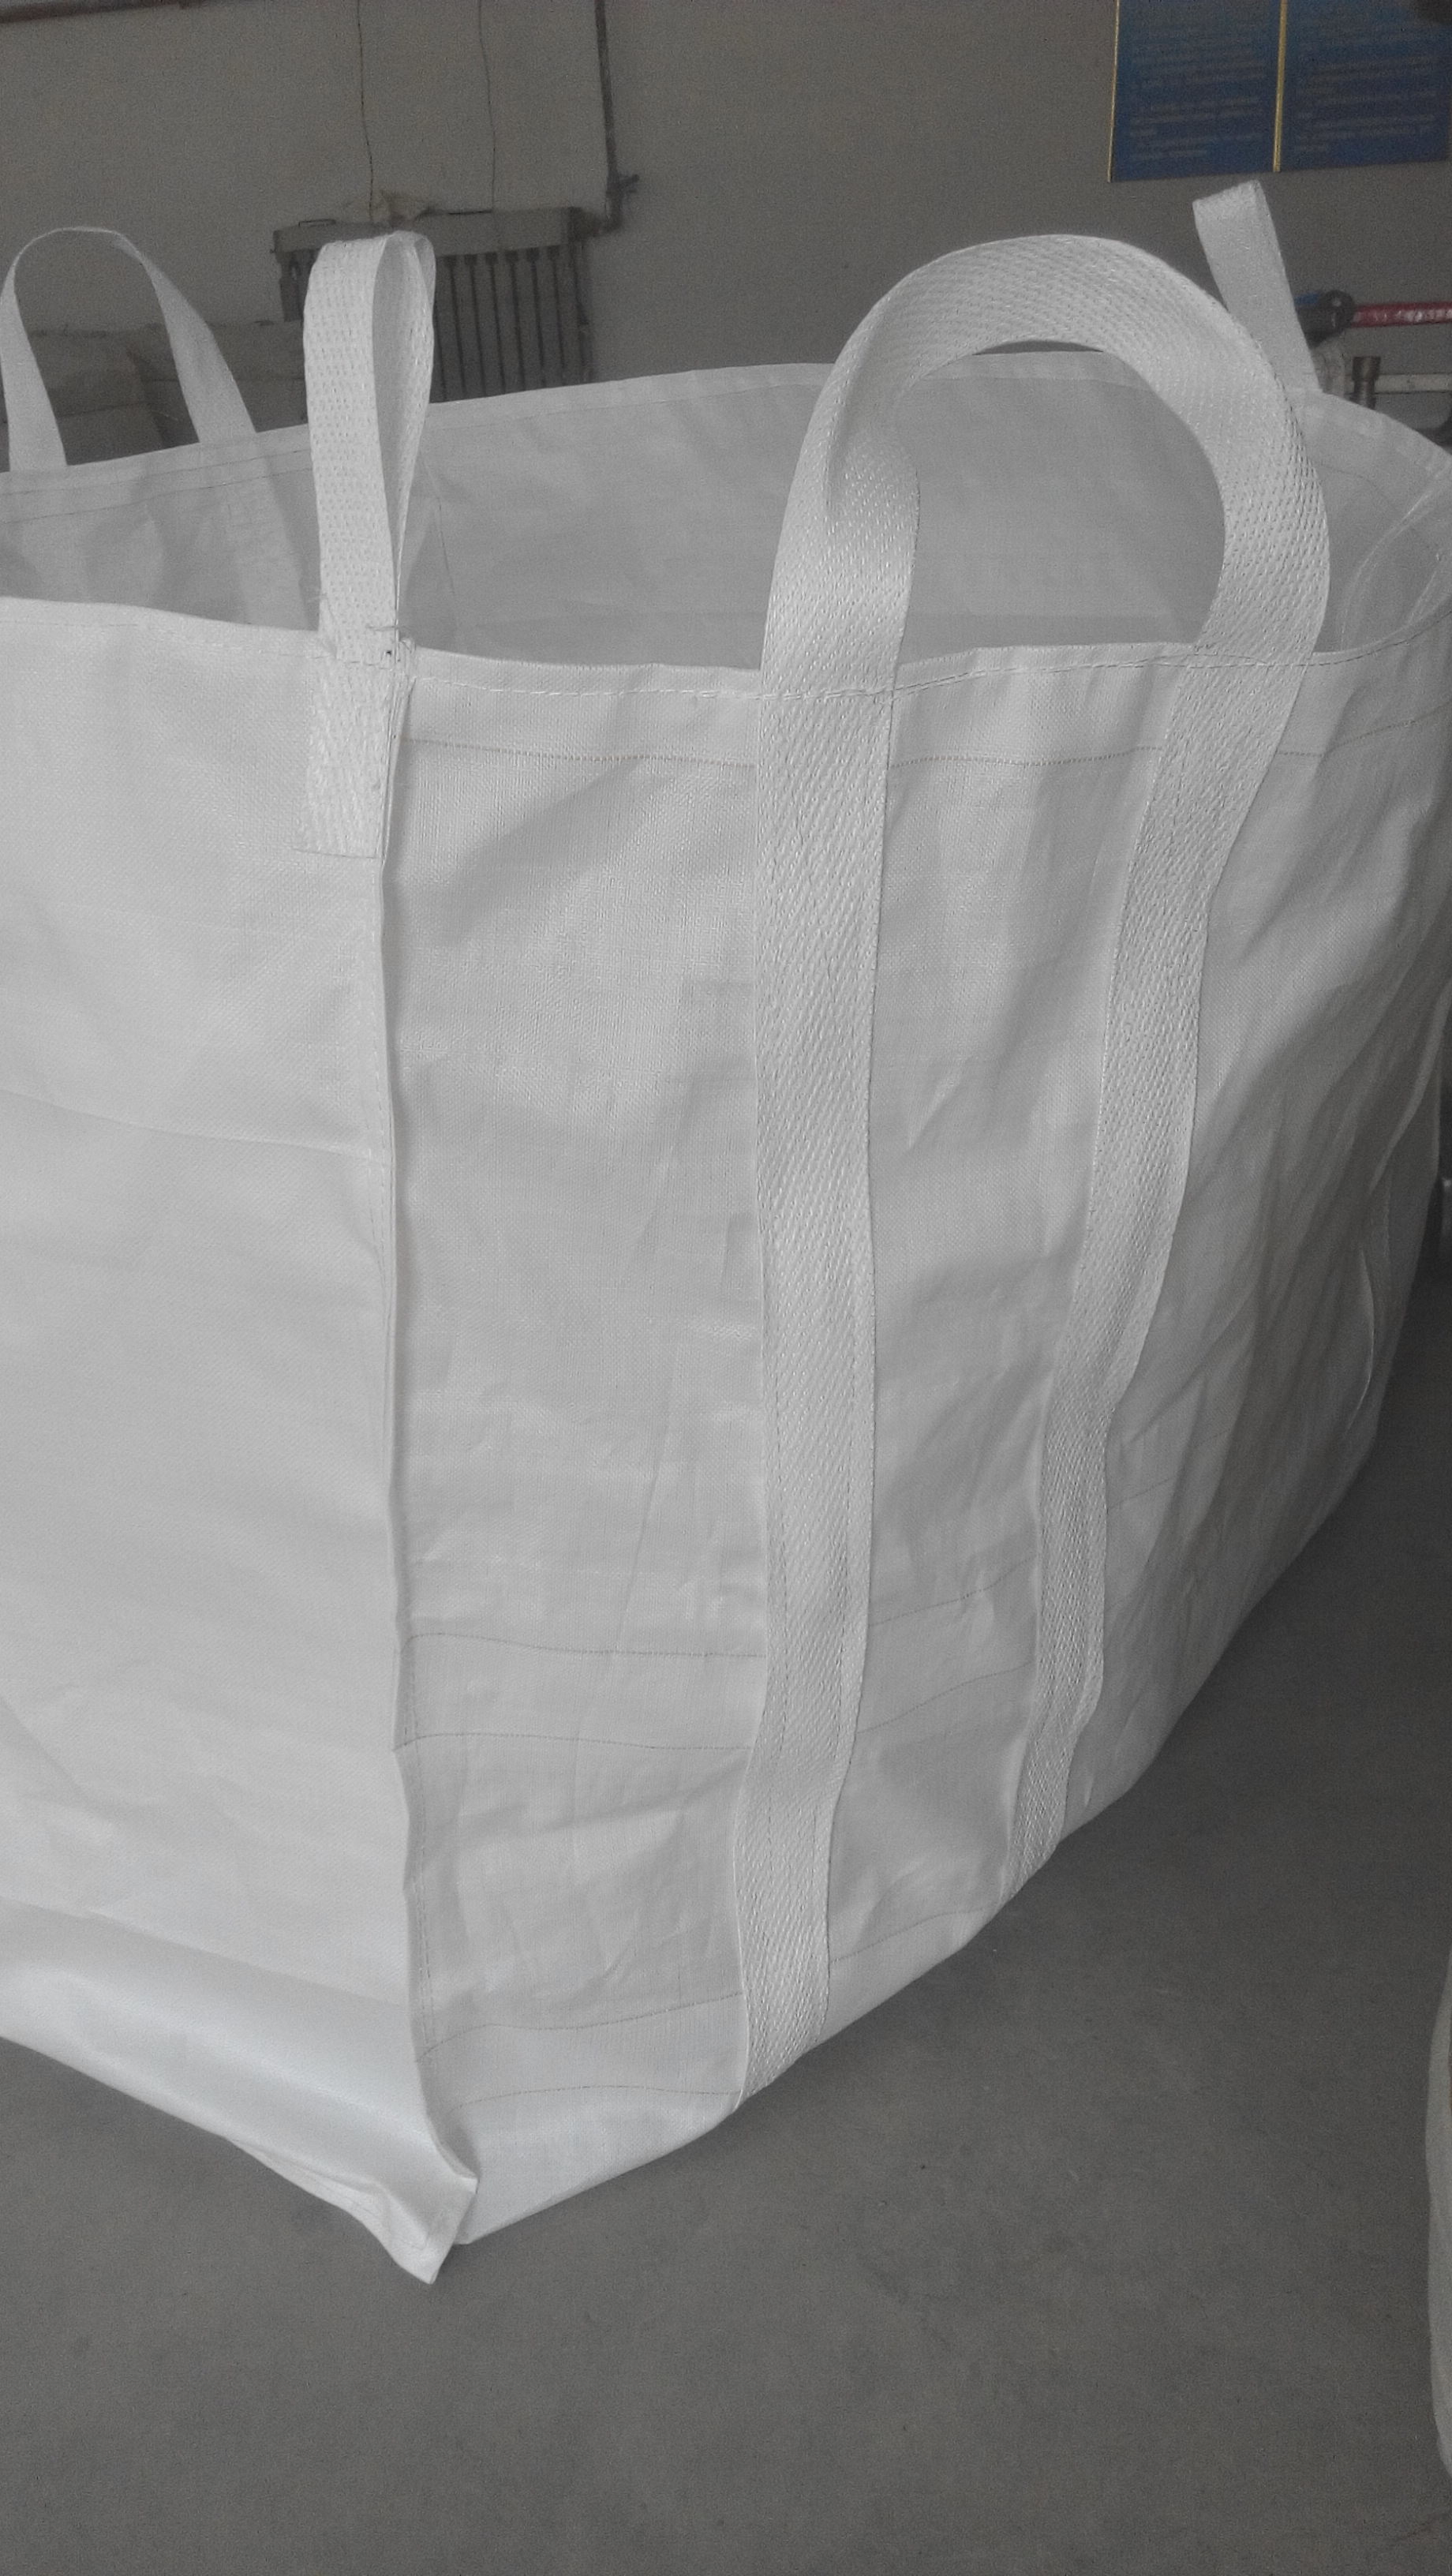 Polypropylene Woven Jumbo Bag Newbridge Services